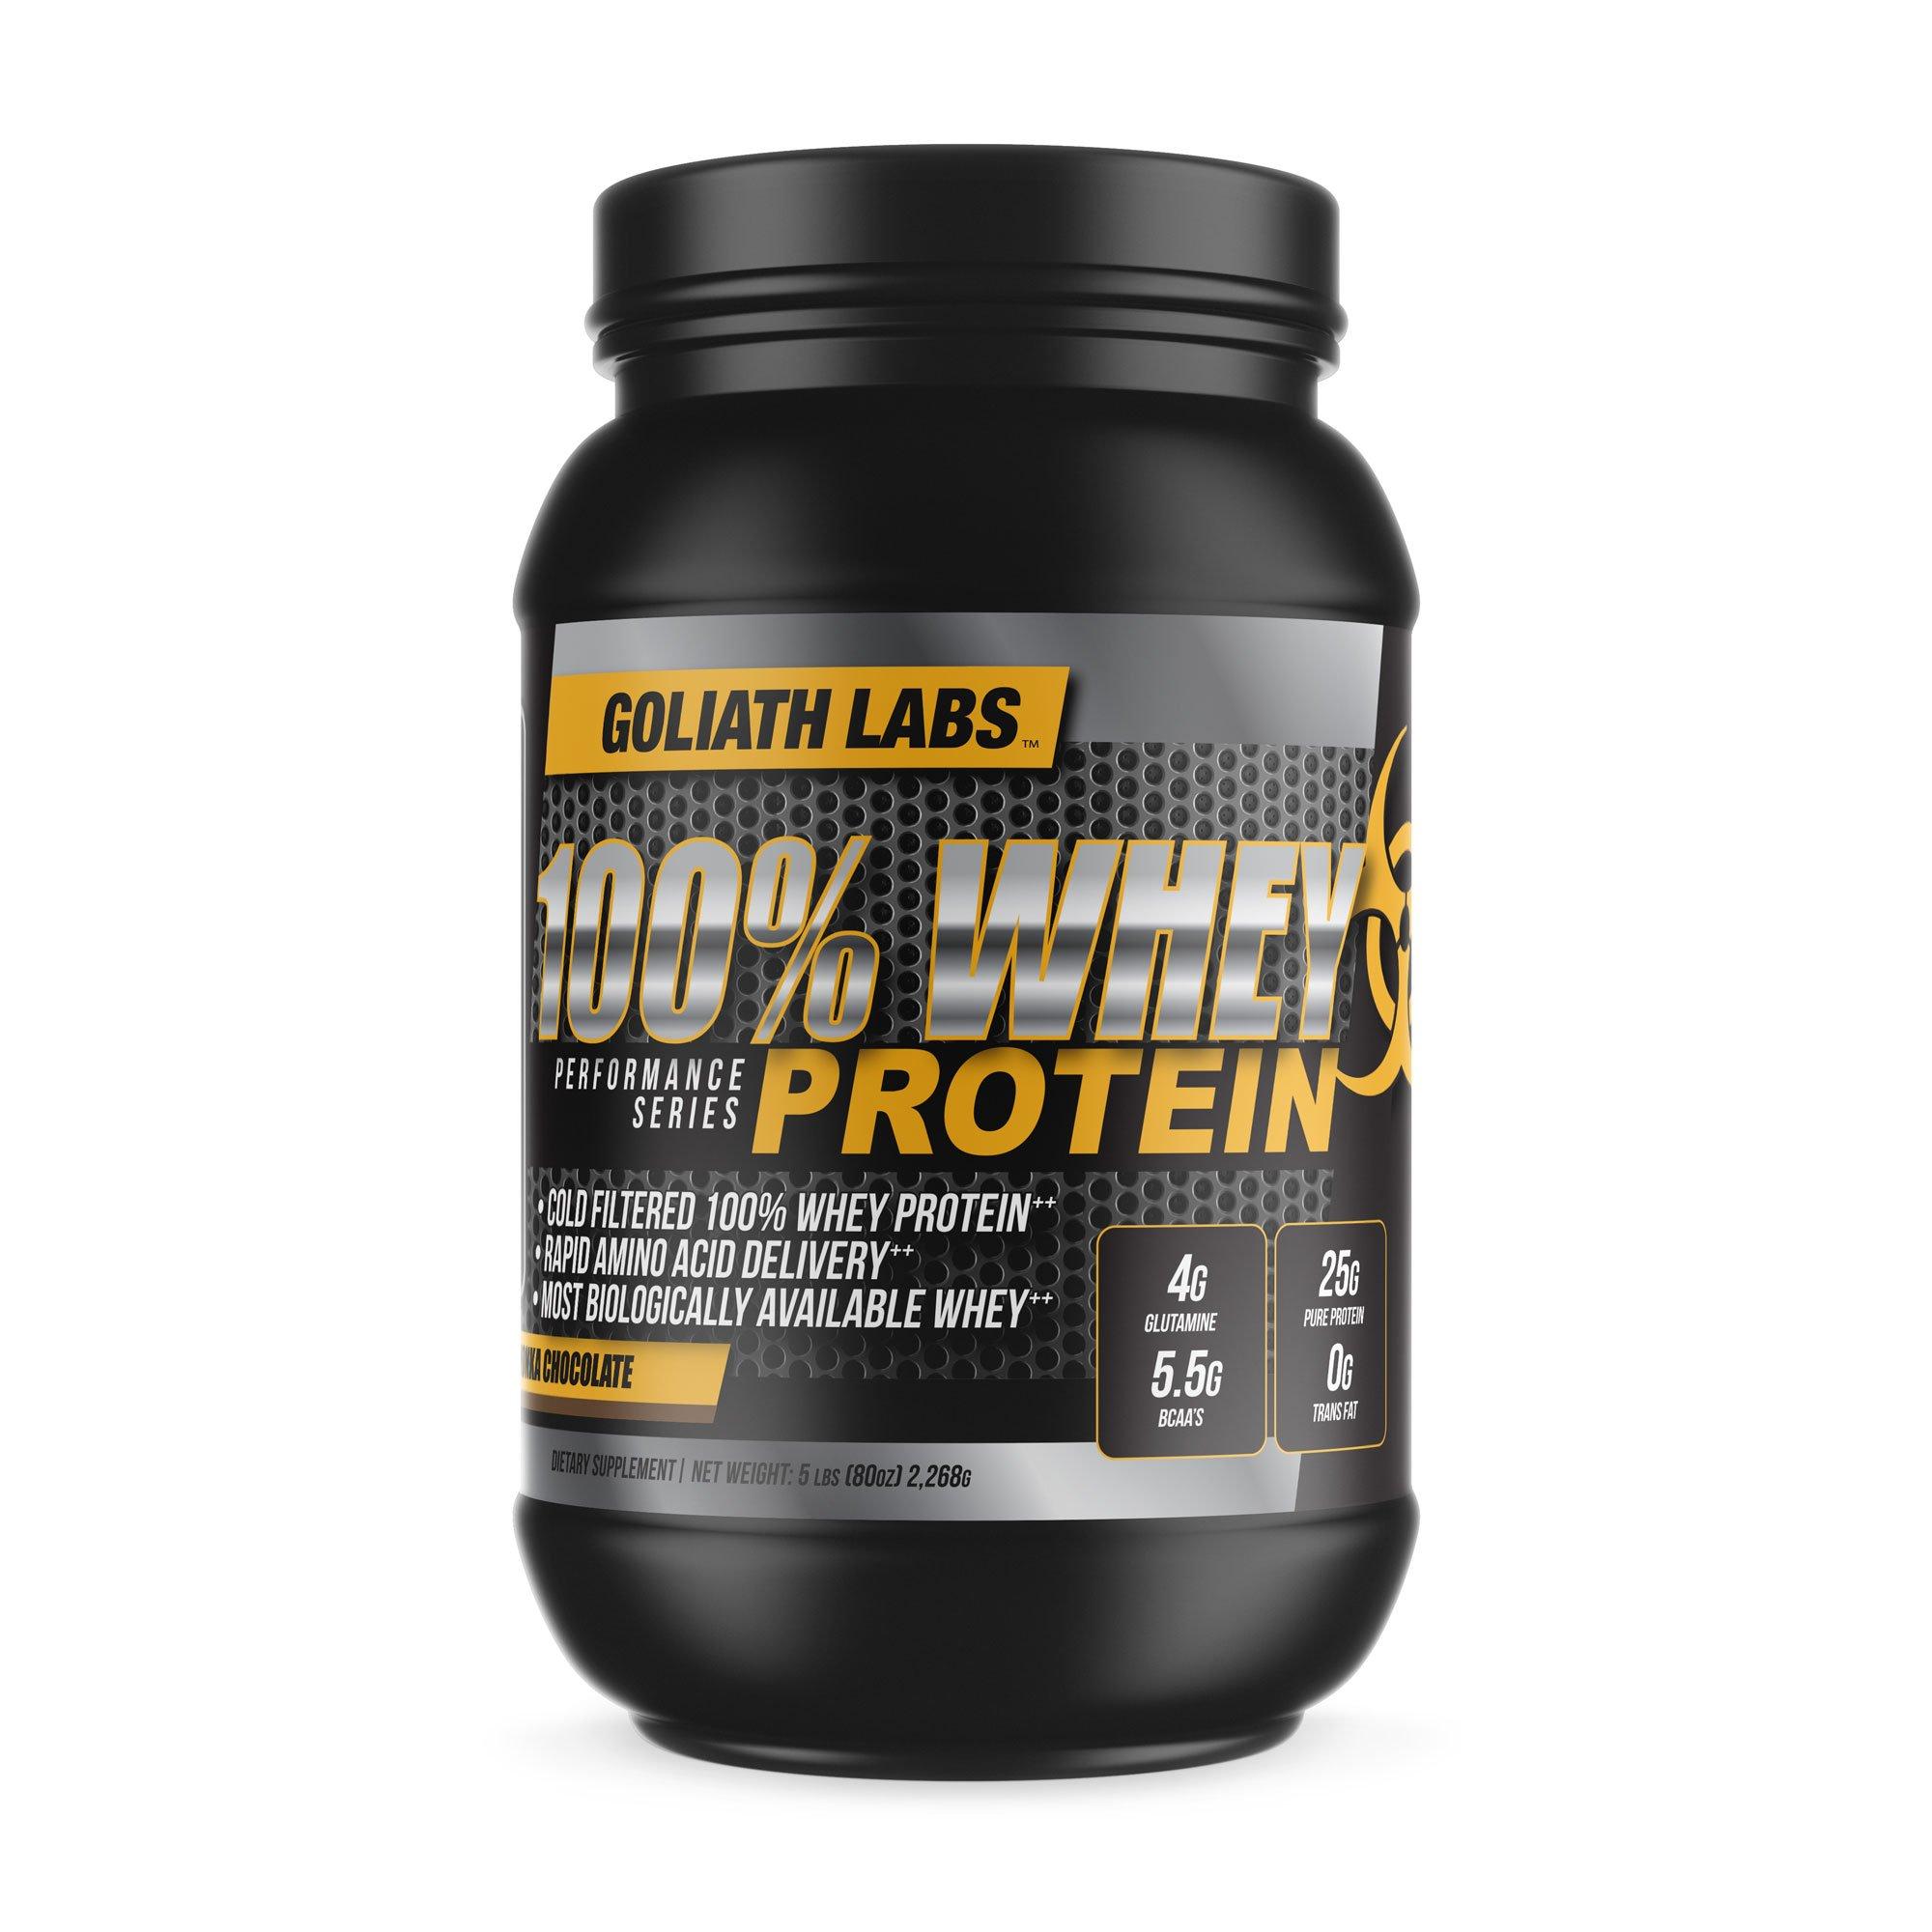 ⧫ 100% Whey Protein Powder 20 lb by Goliath Labs (Chocolate)